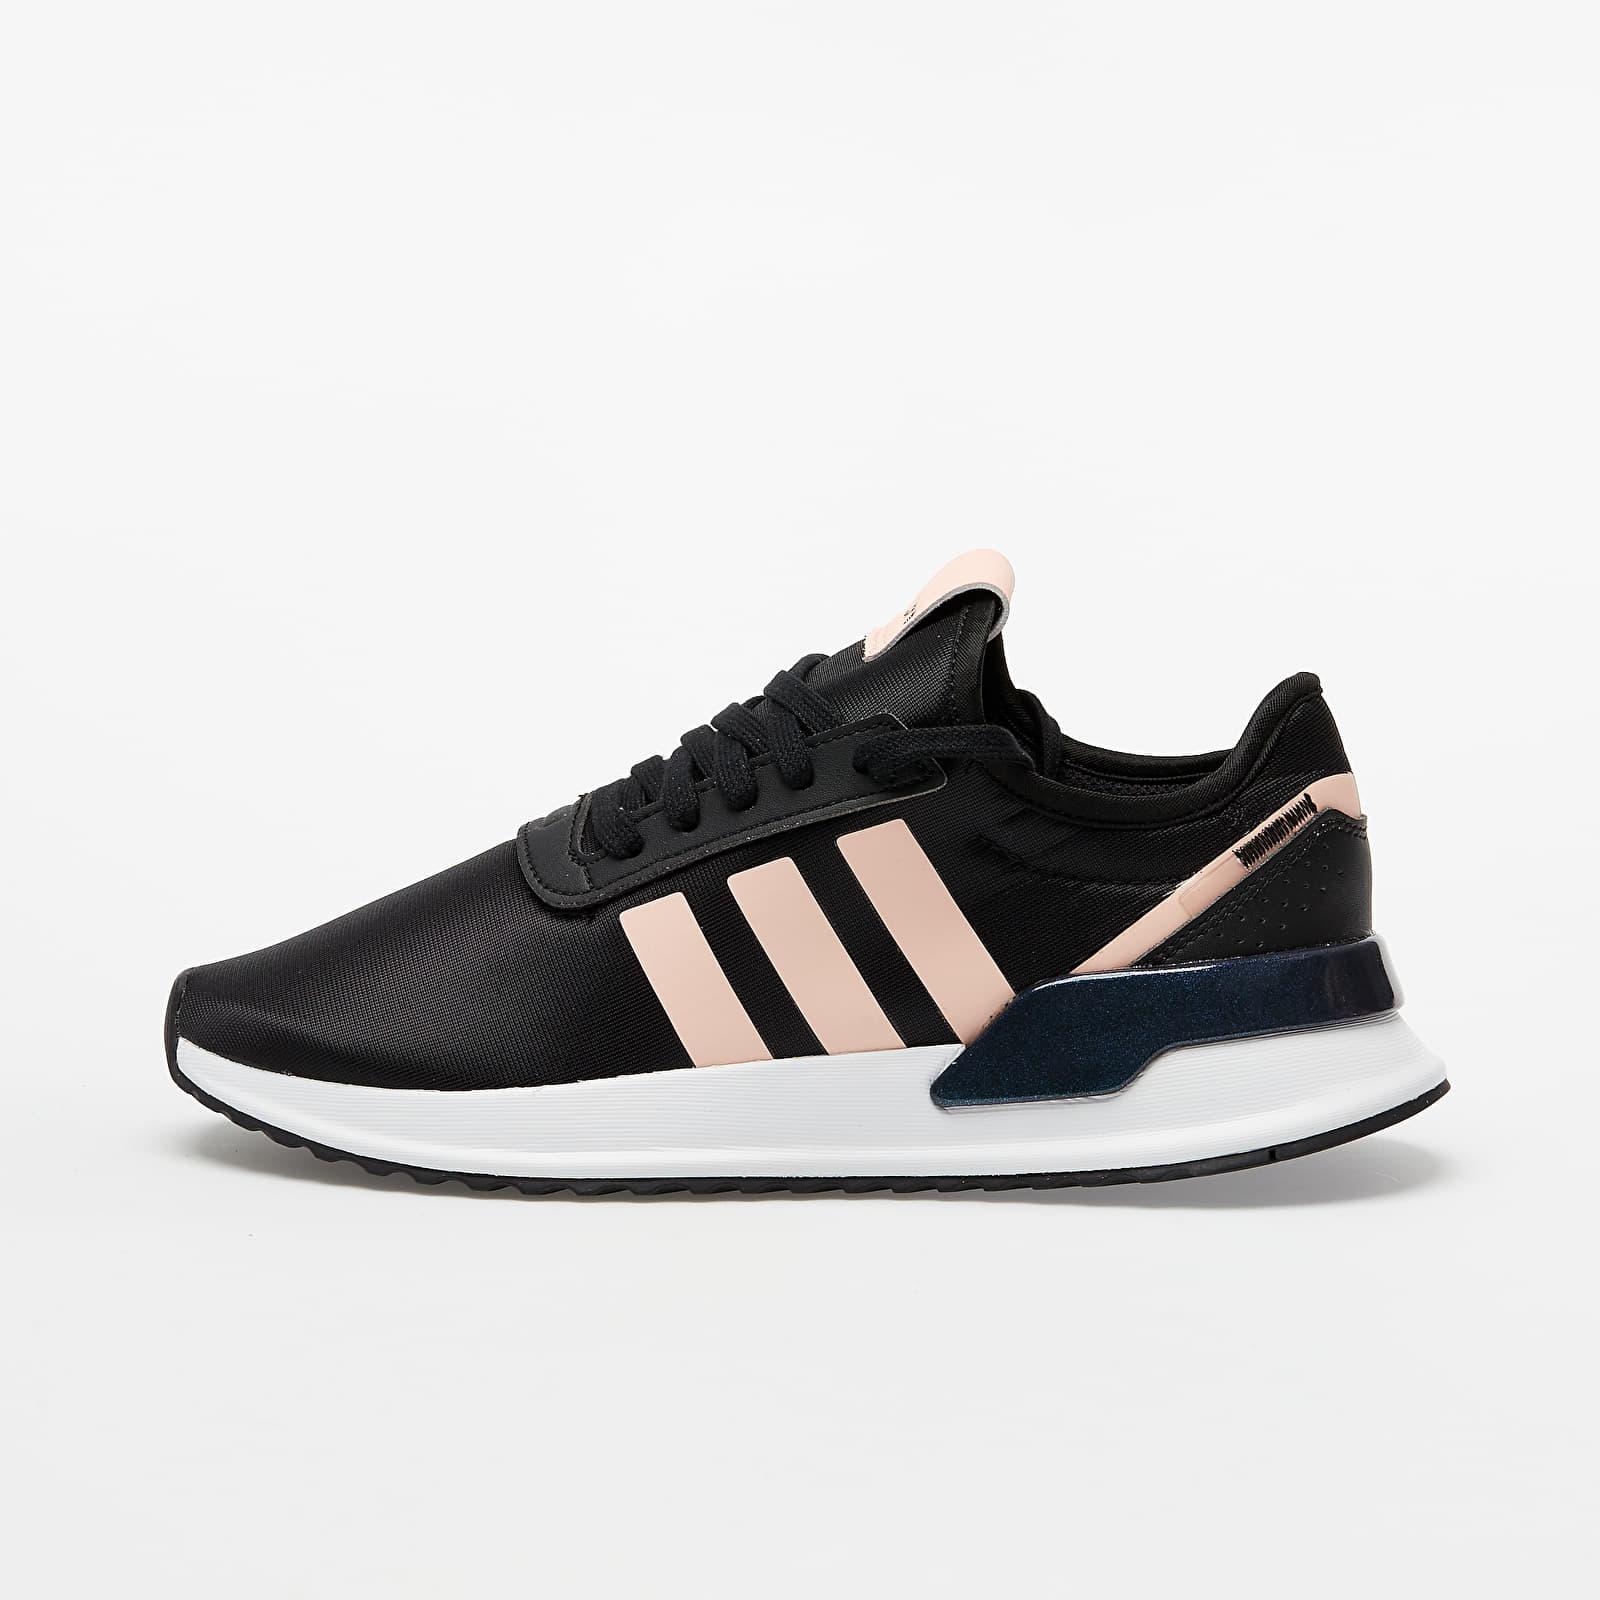 Dámské tenisky a boty adidas U_Path X W Core Black/ Core Black/ Haze Coral